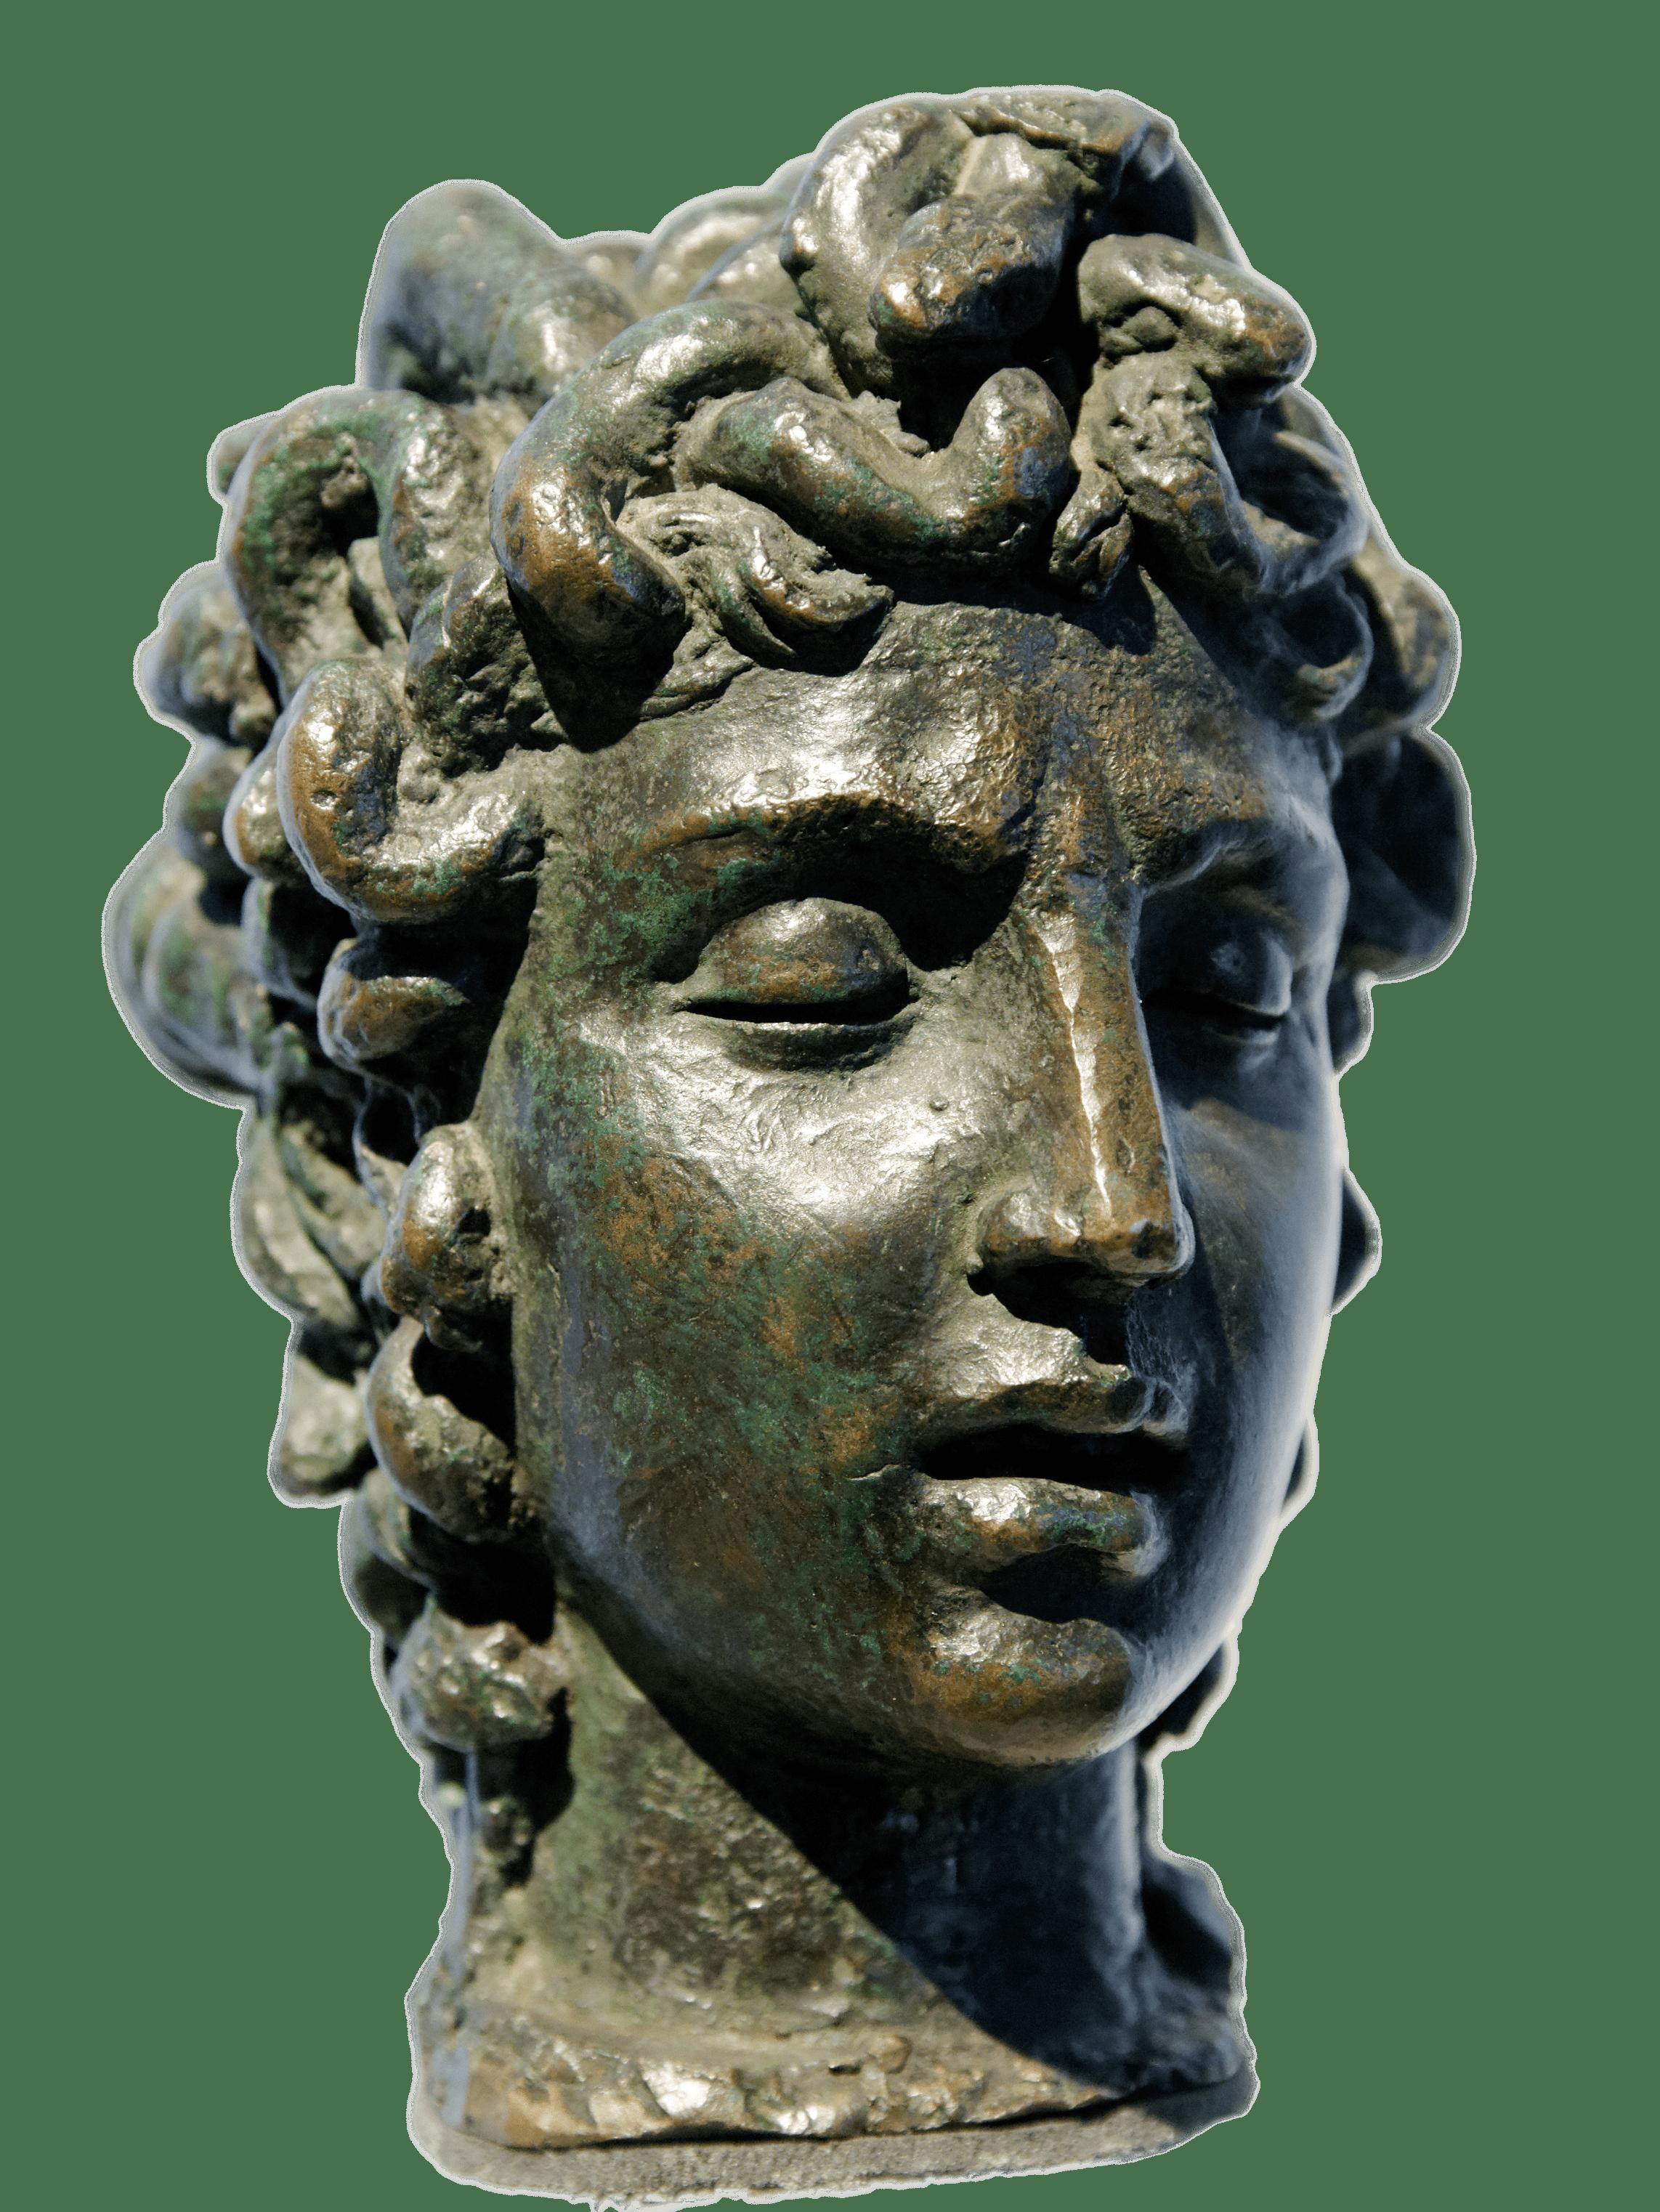 Statue Head Of Medusa Transparent Png Stickpng